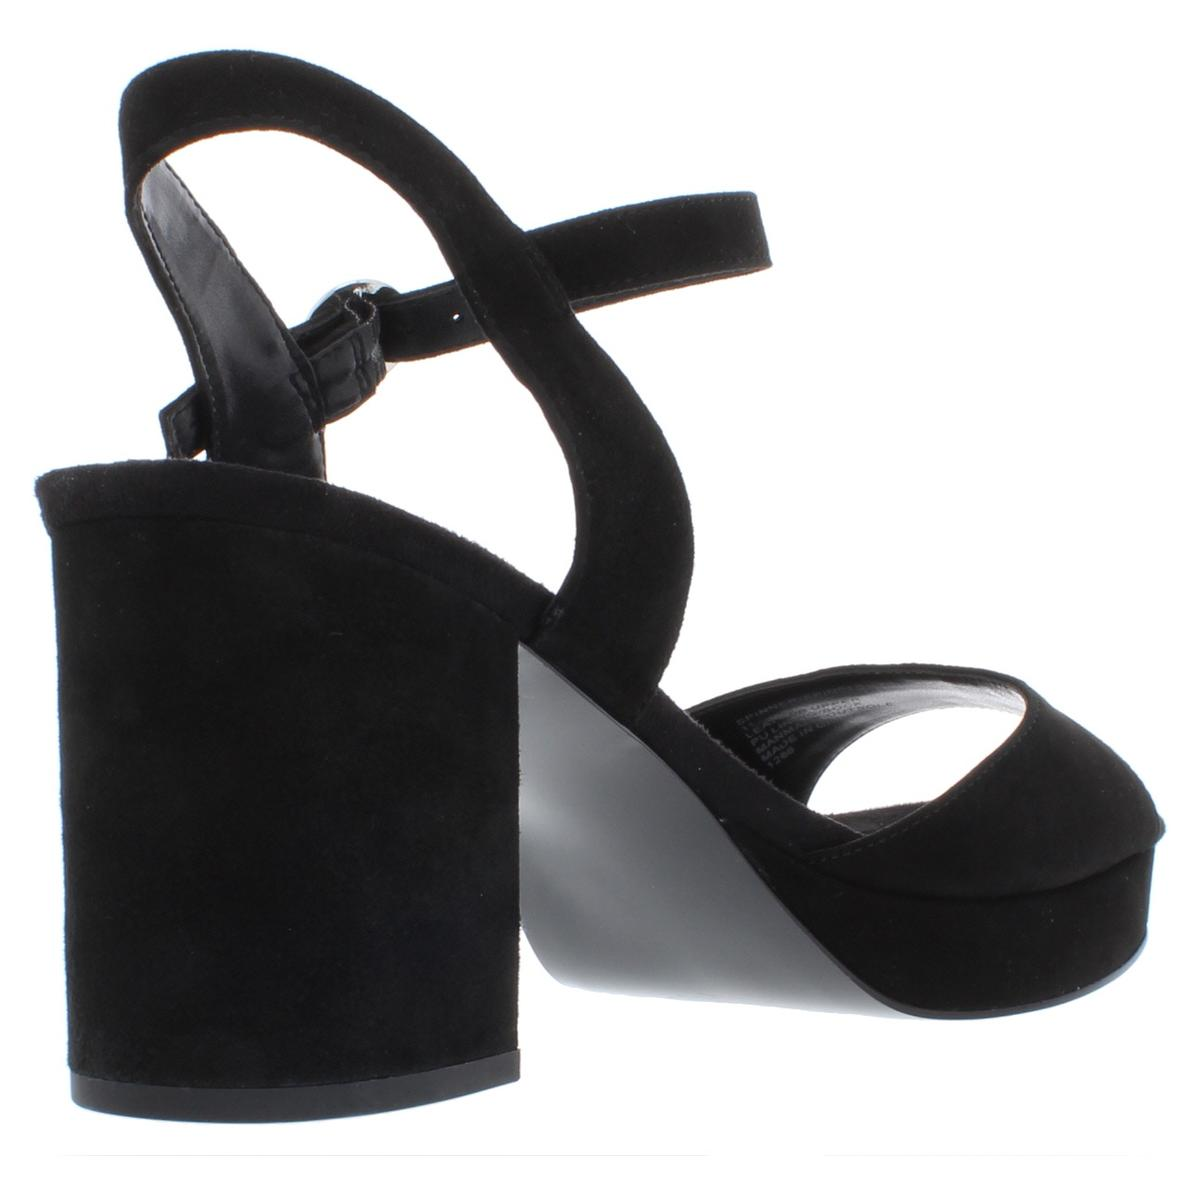 Steve-Madden-Womens-Spinner-Solid-Block-Heel-Dress-Sandals-Shoes-BHFO-1805 thumbnail 4